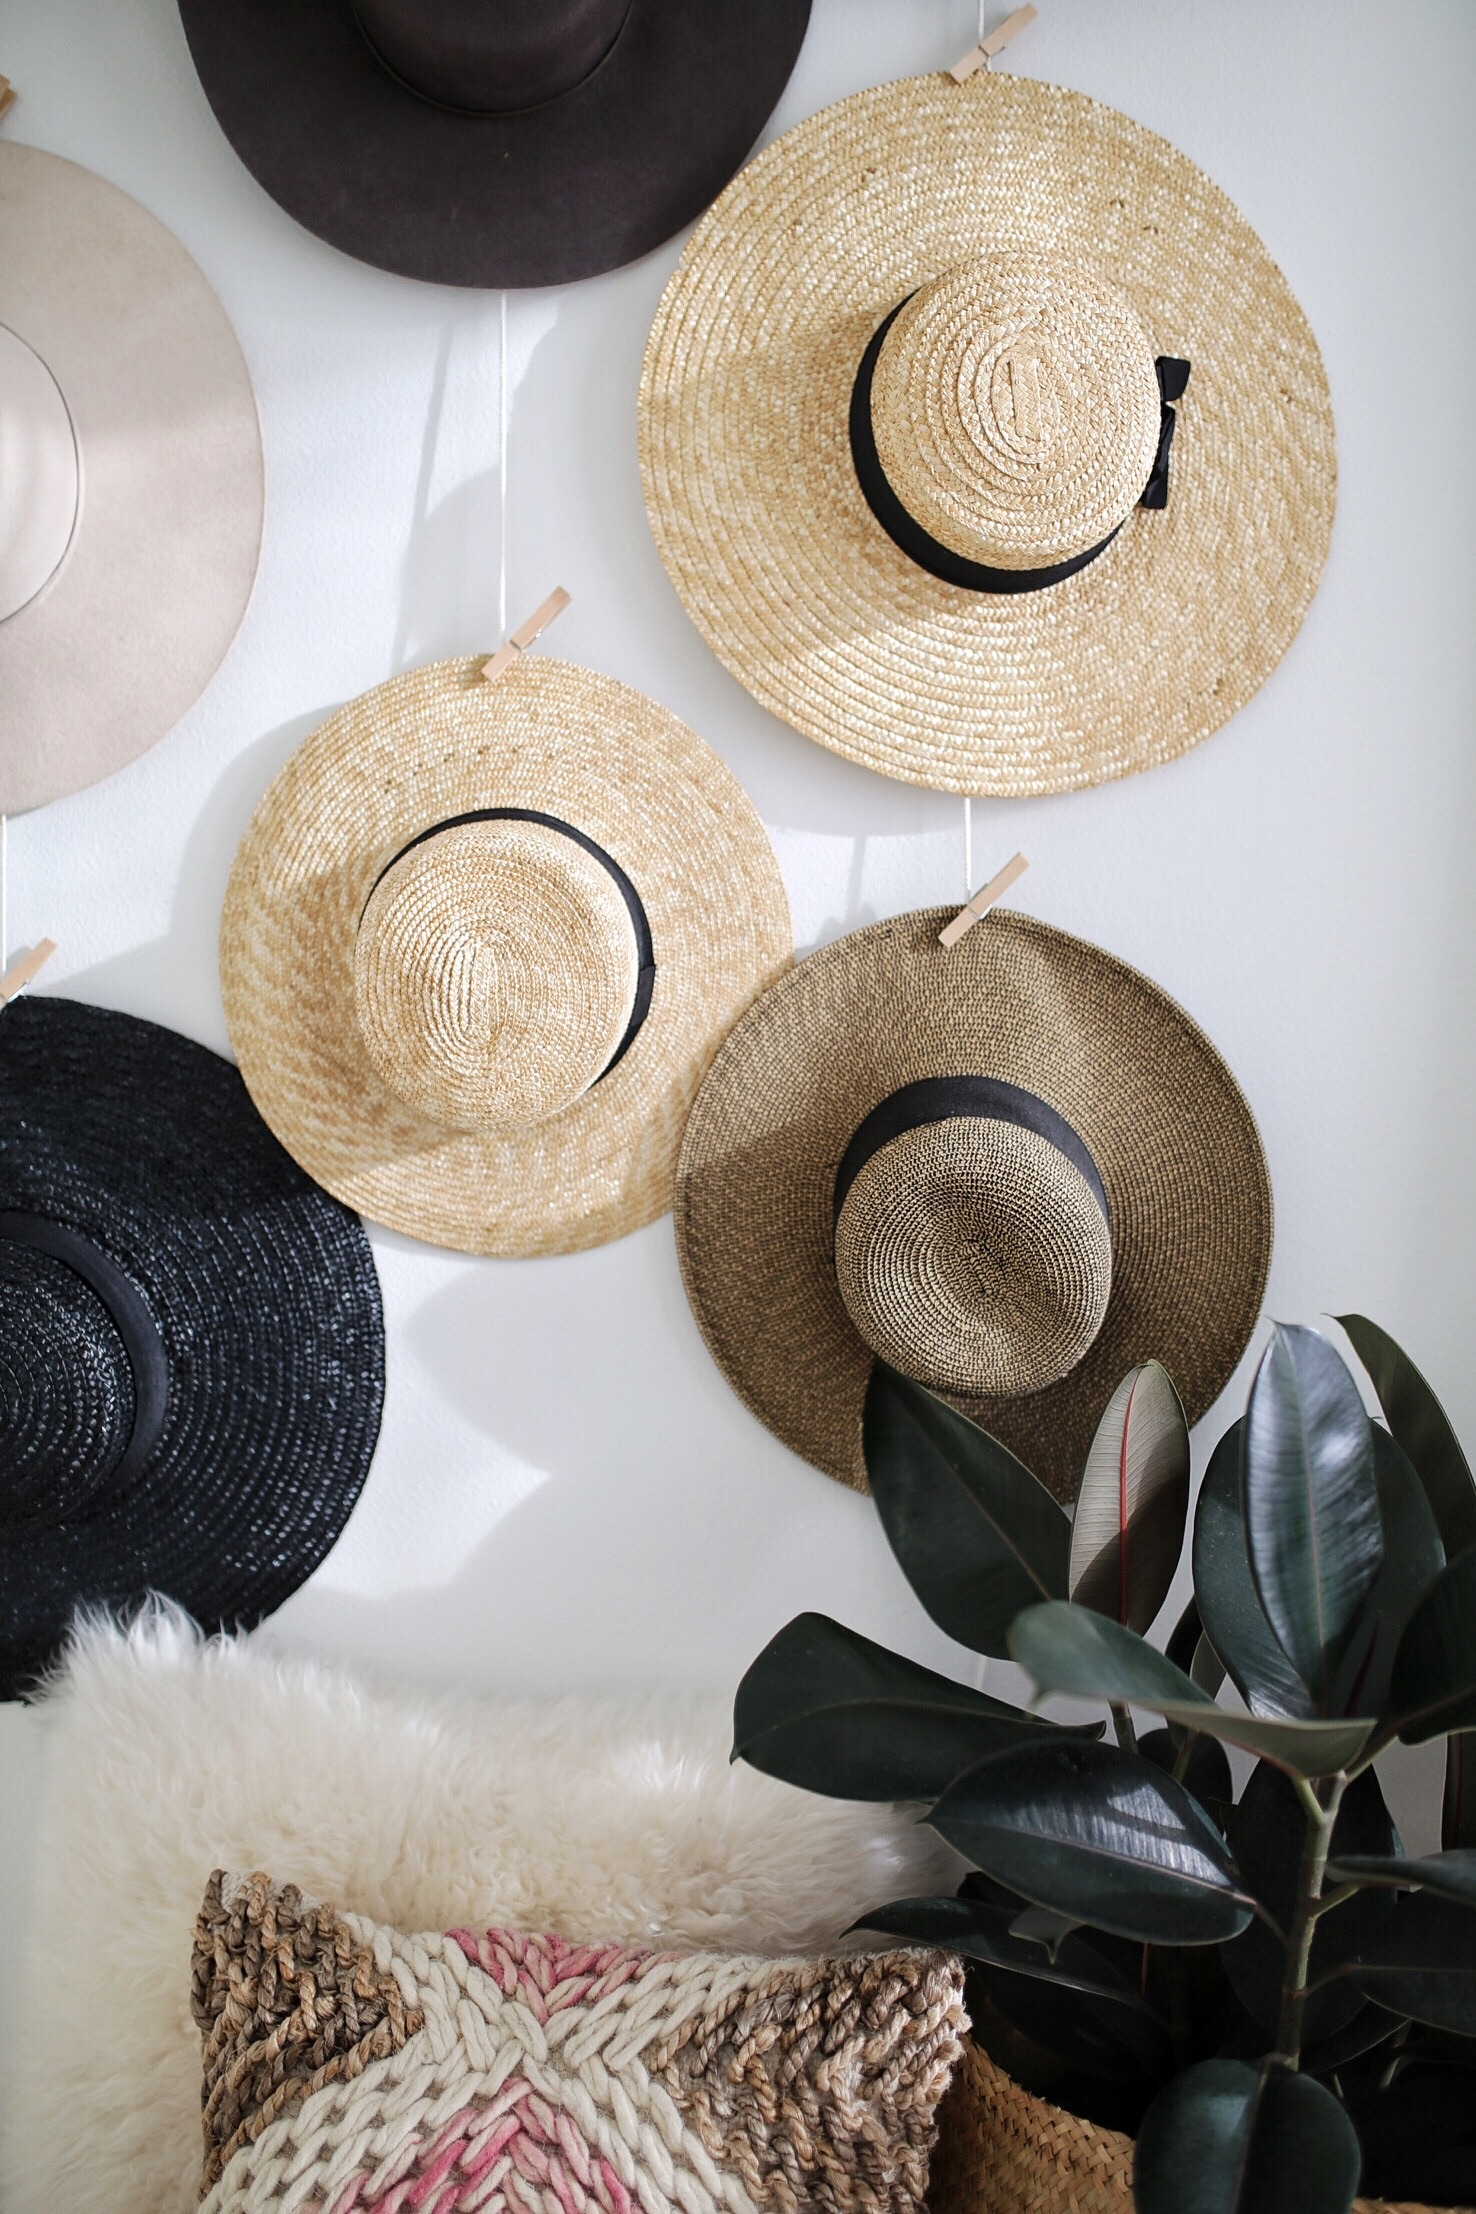 DIY Hanging Hat Rack Wall Display